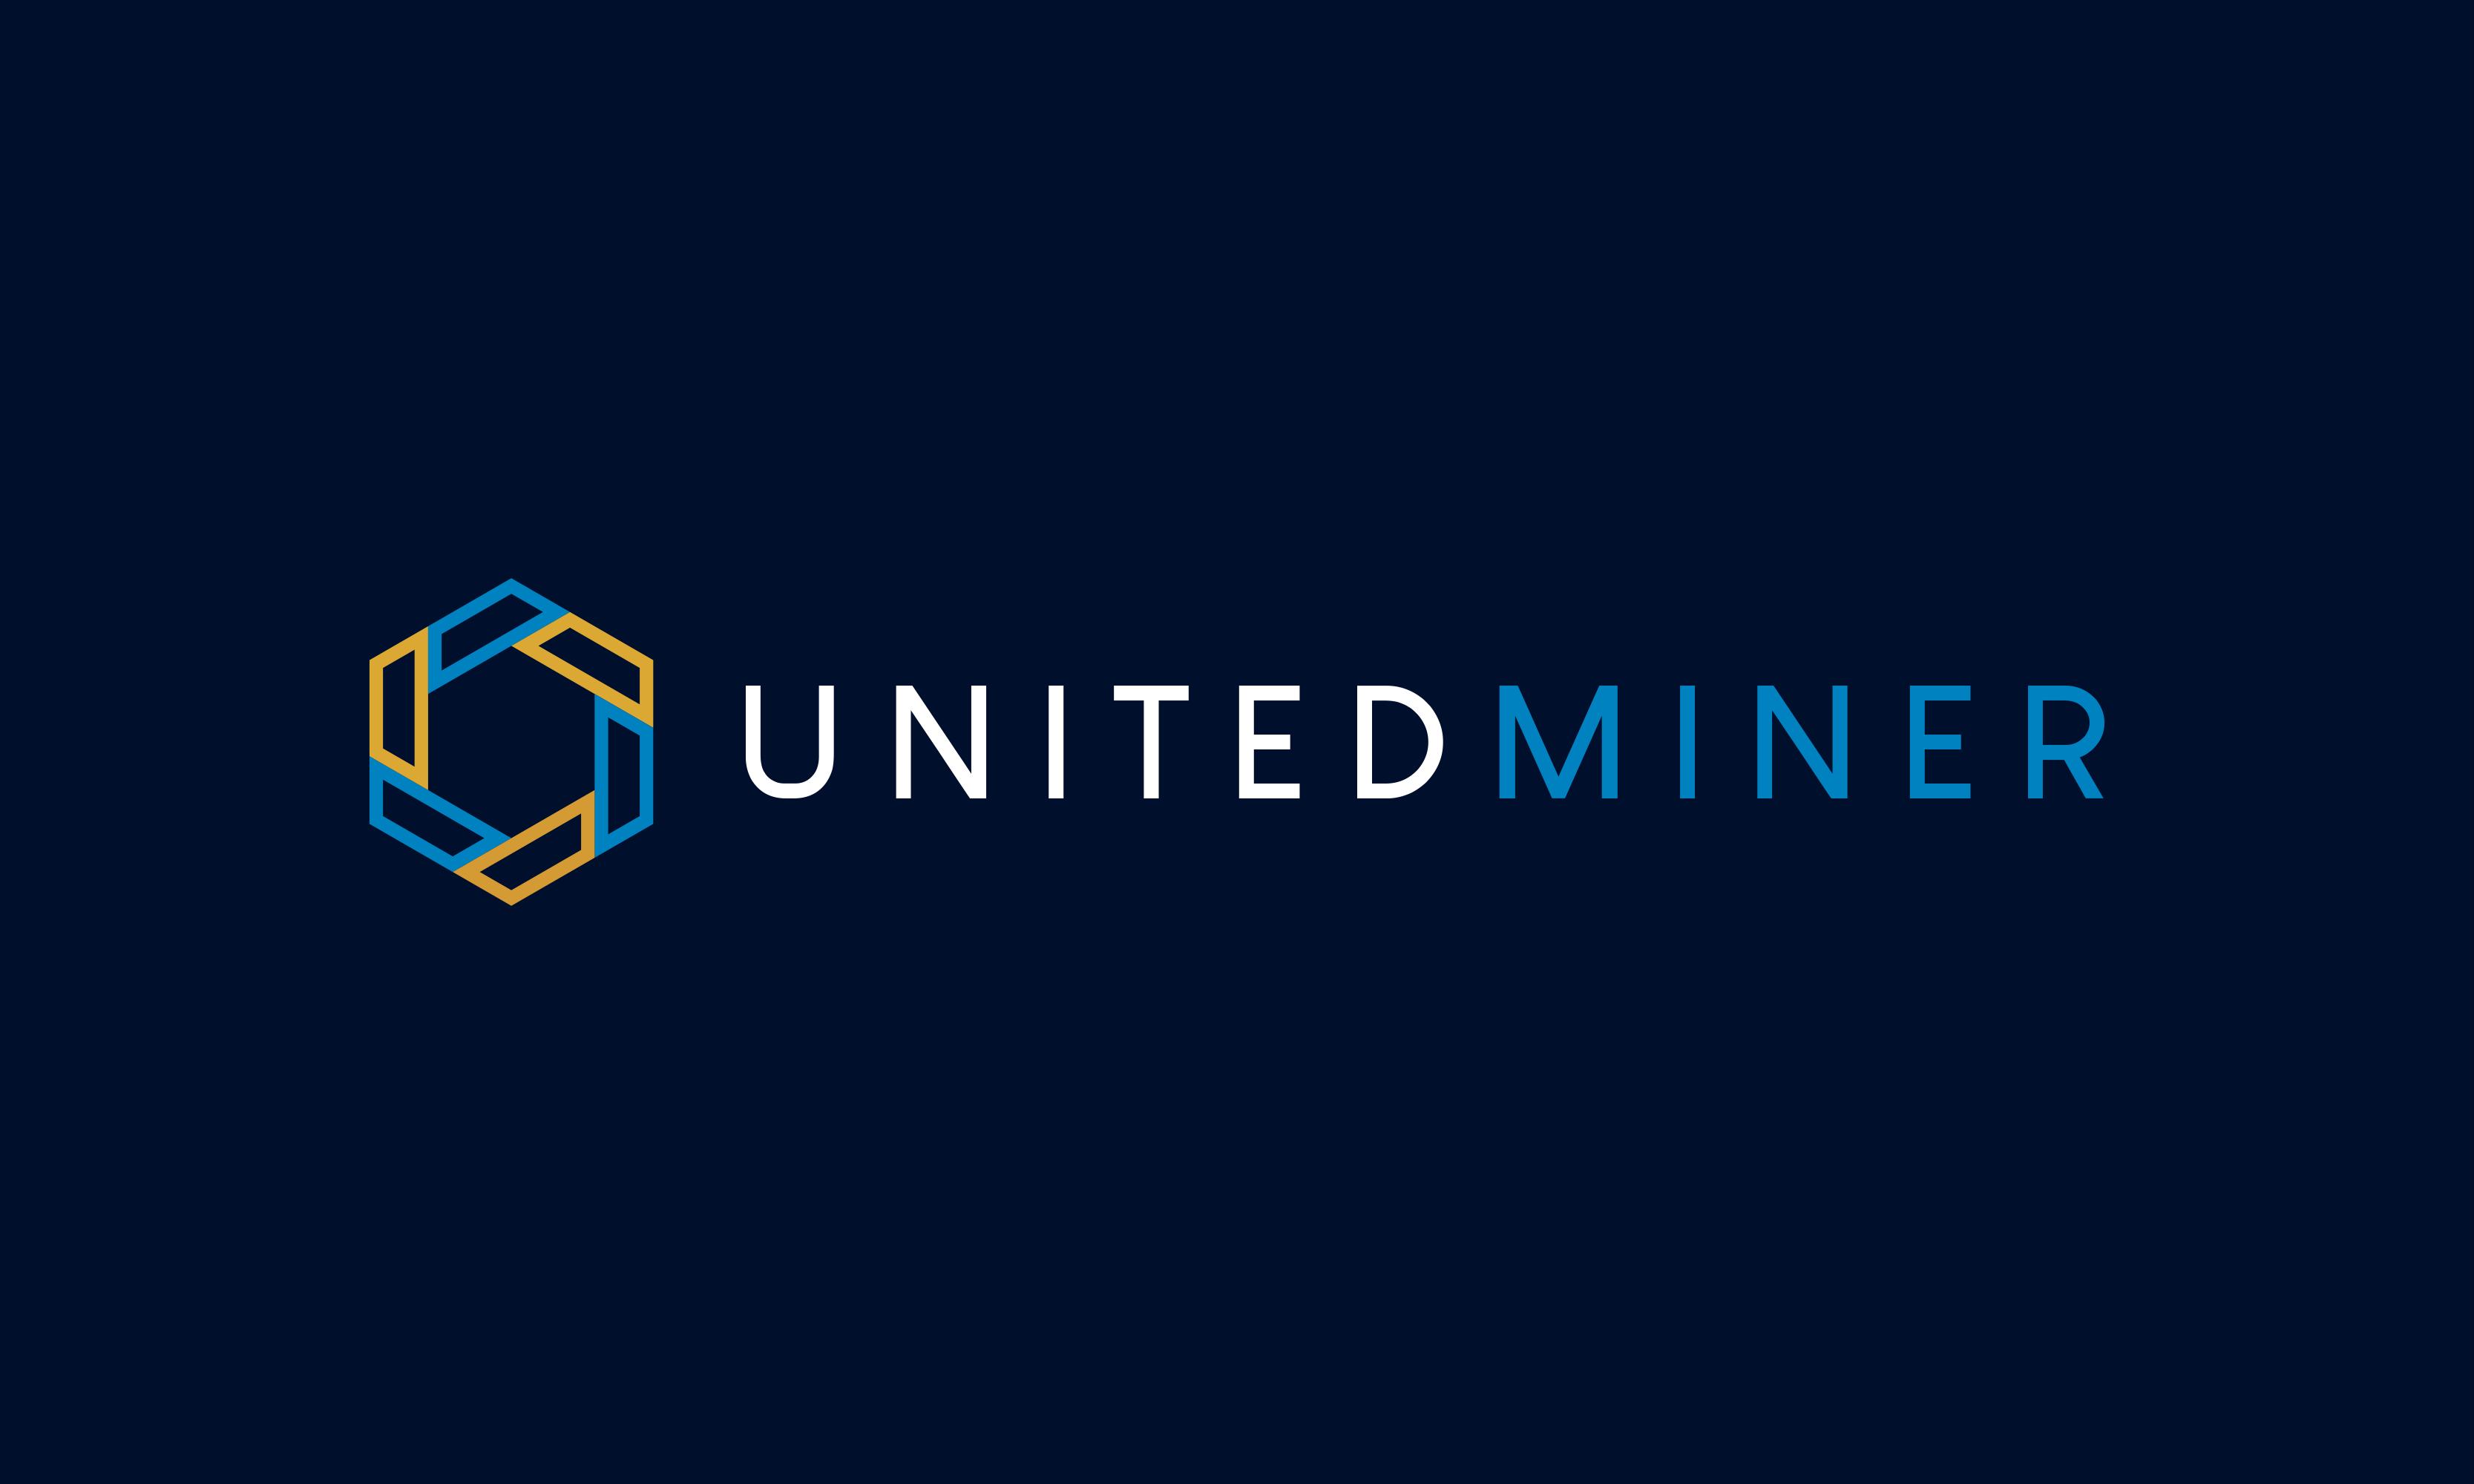 Unitedminer